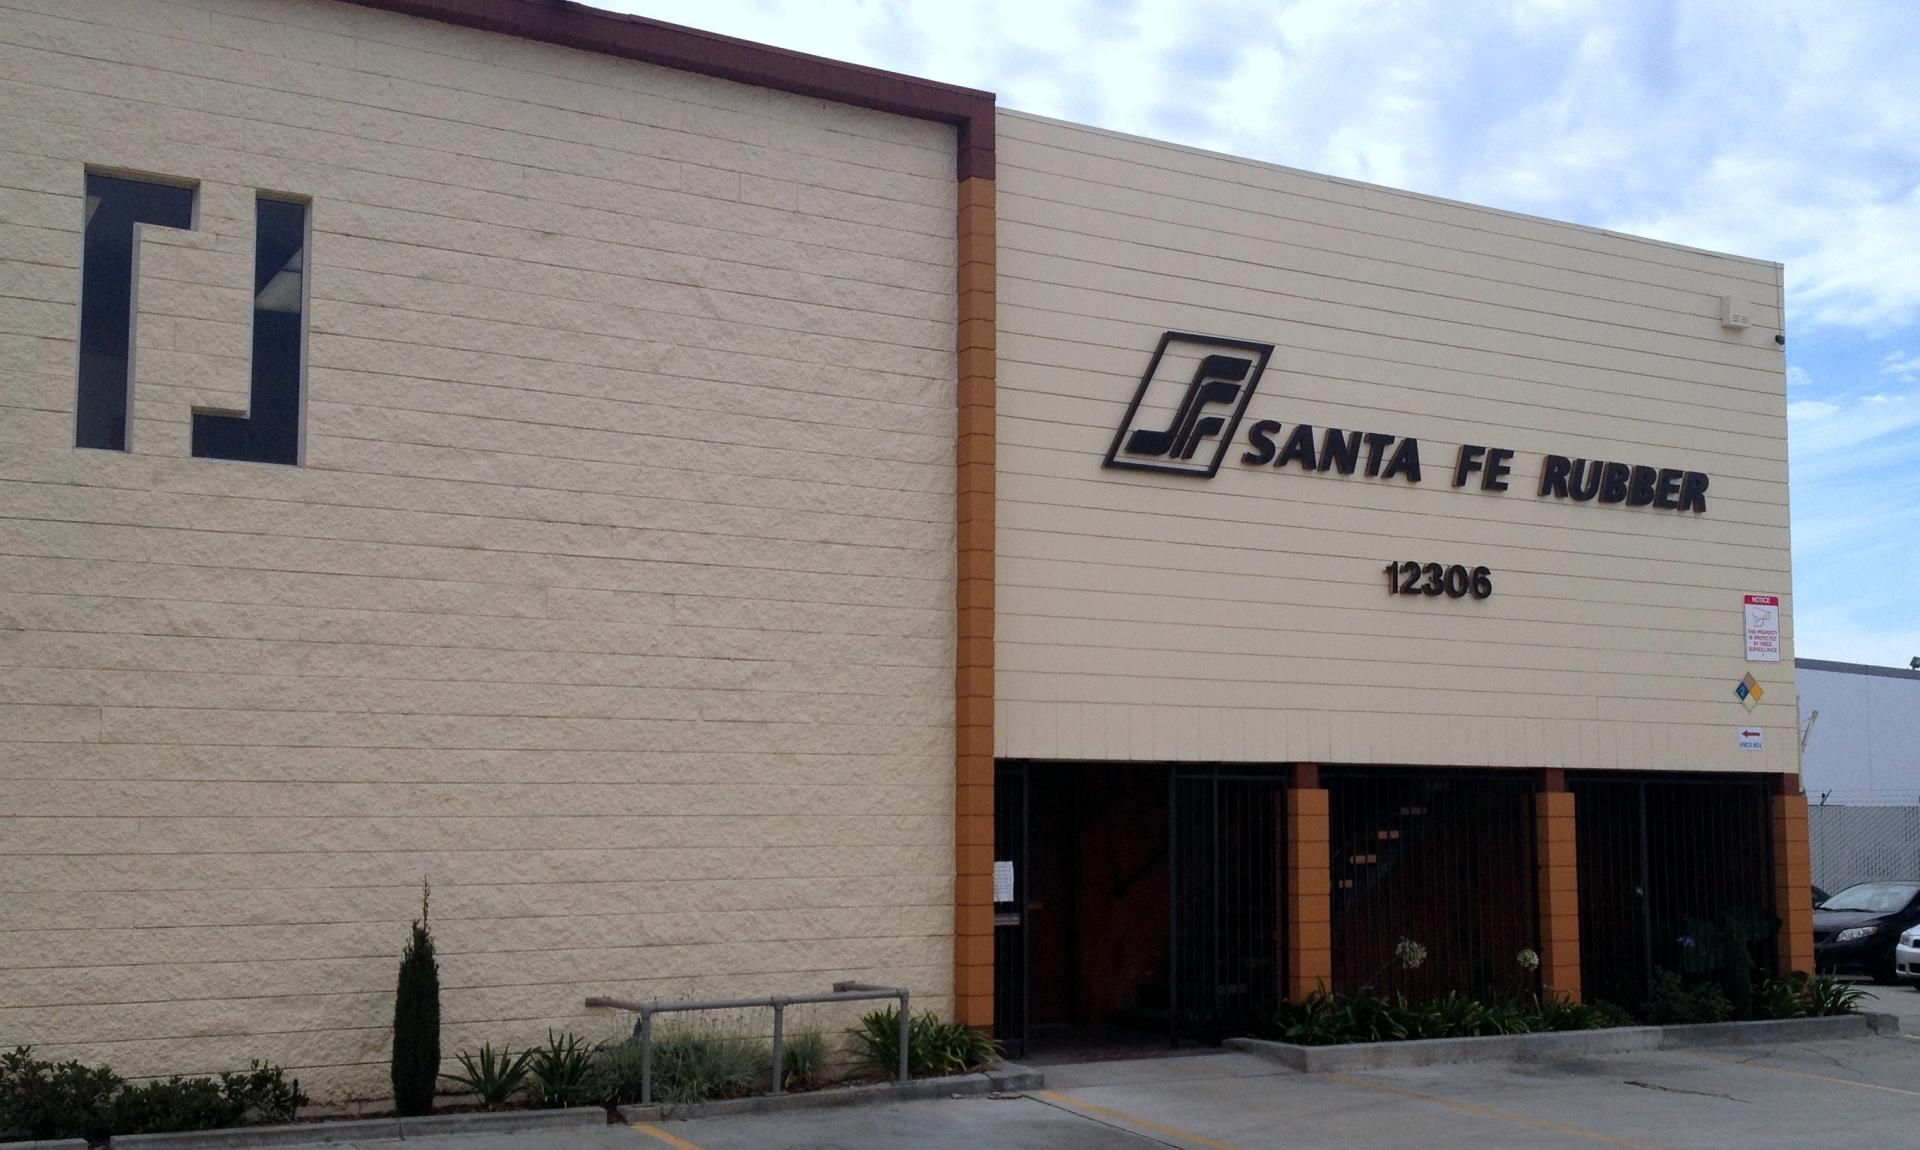 Take A Virtual Tour Of Santa Fe Rubber Products, Inc.